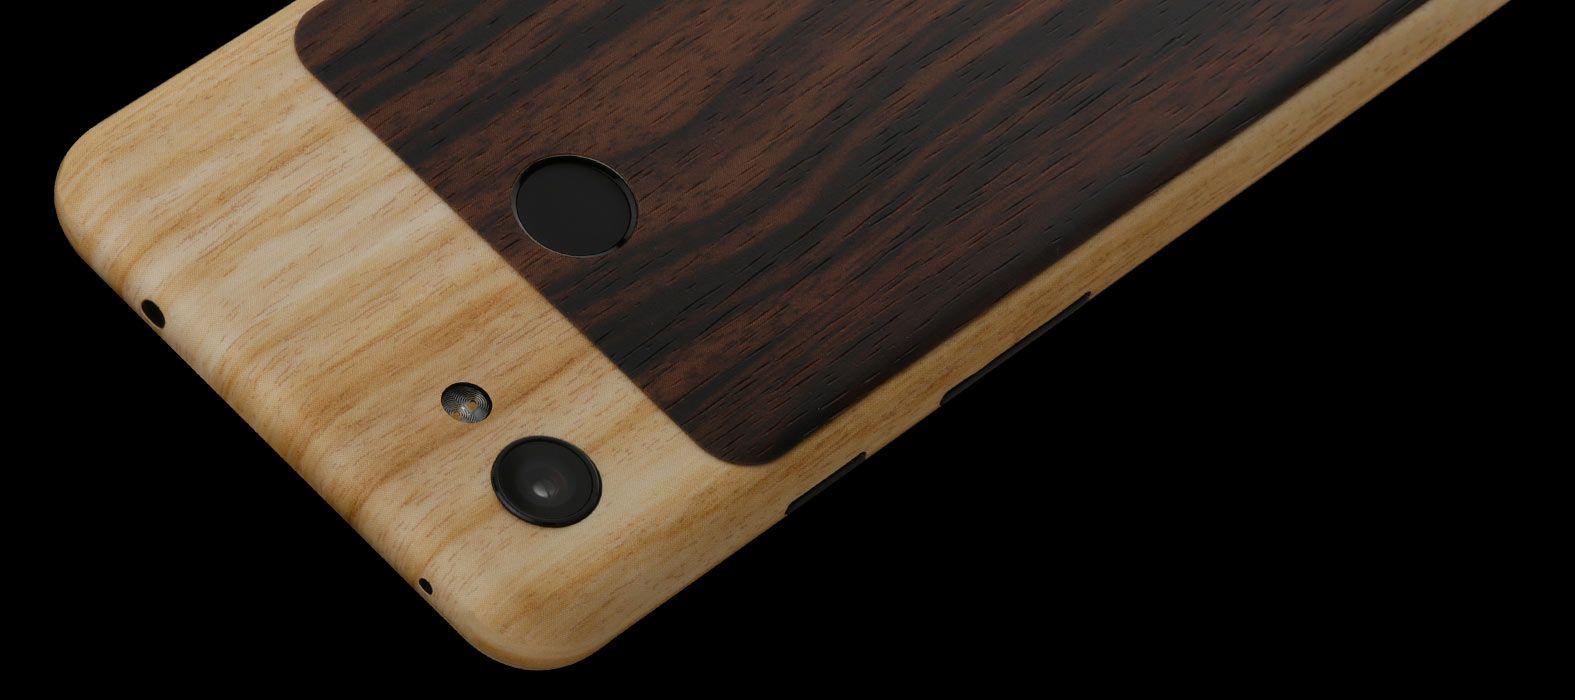 Pixel 3aXL Bamboo With Ebony Skins